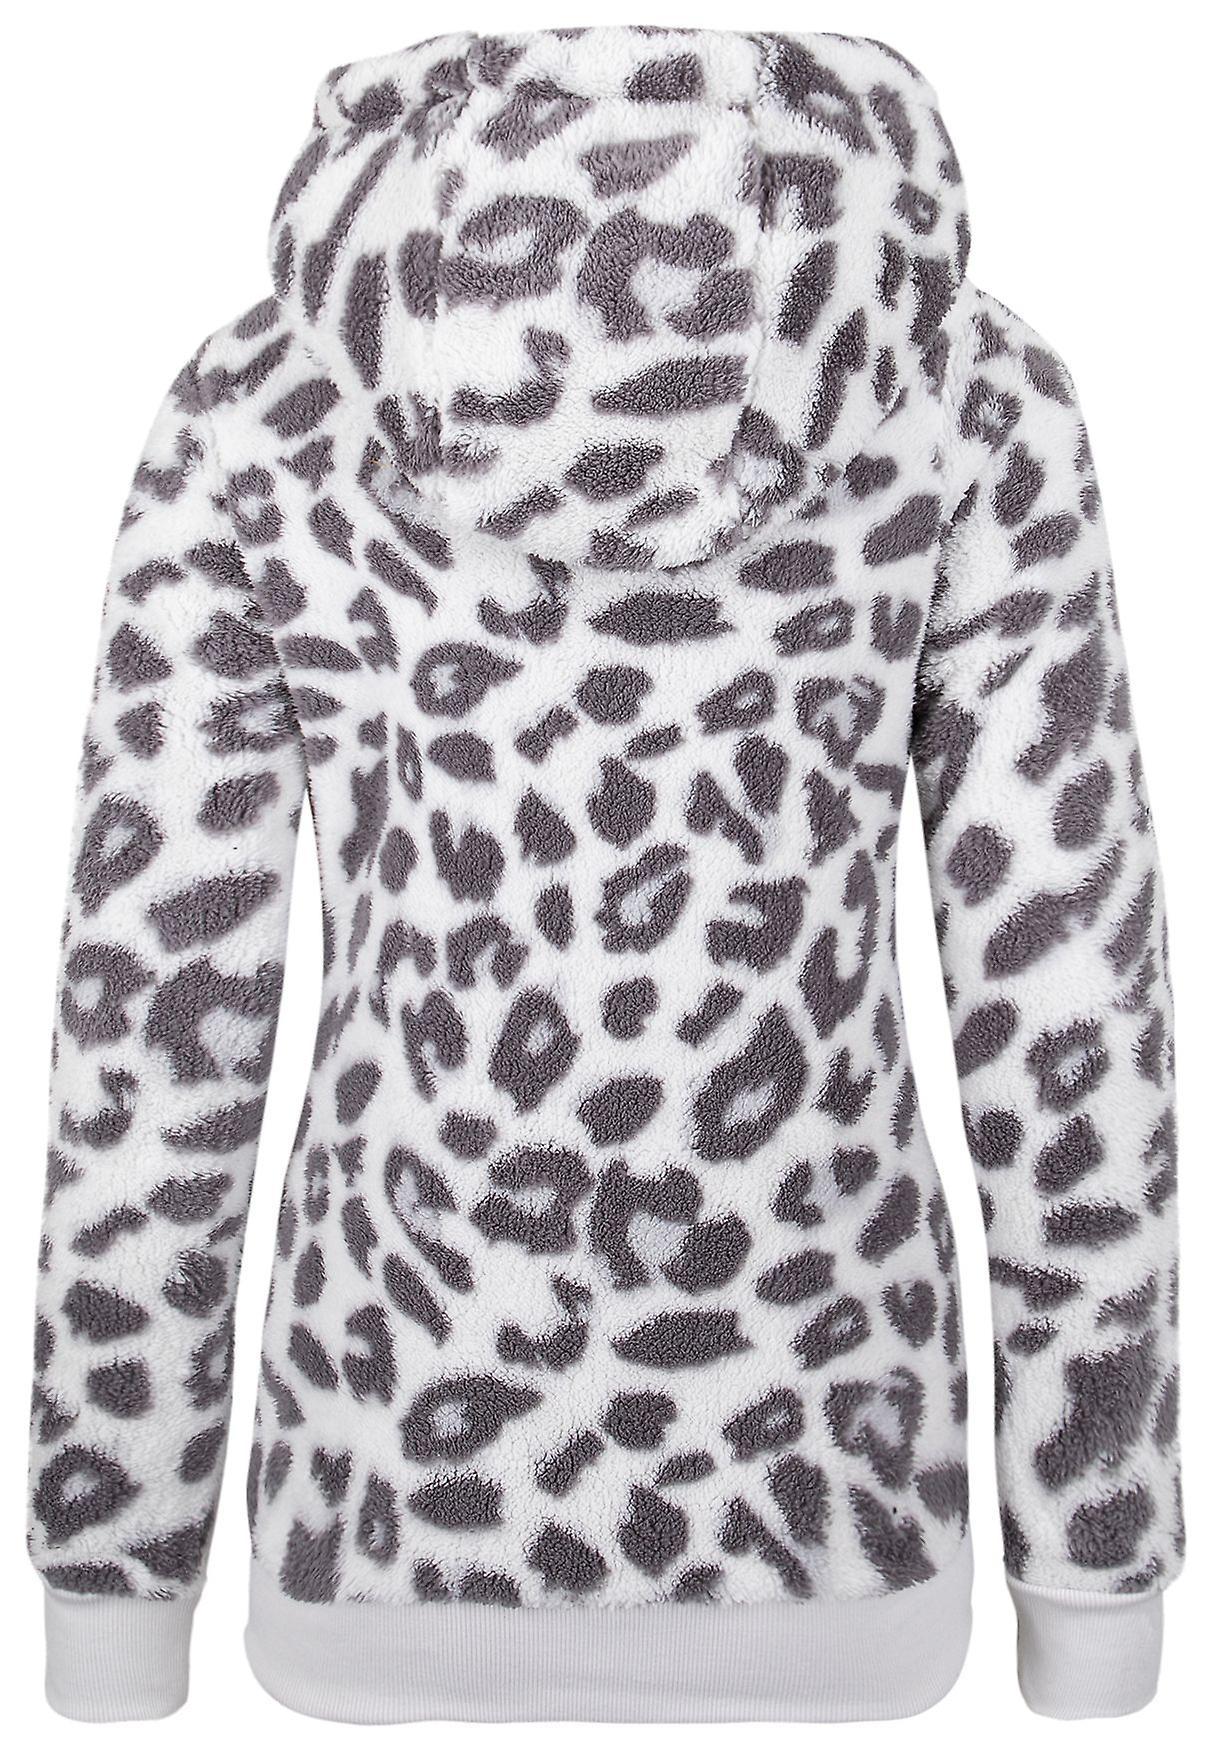 Sublevel Womens Fleece Hoodie Leopard Sweater Pullover Plush Jumper Longsleeve